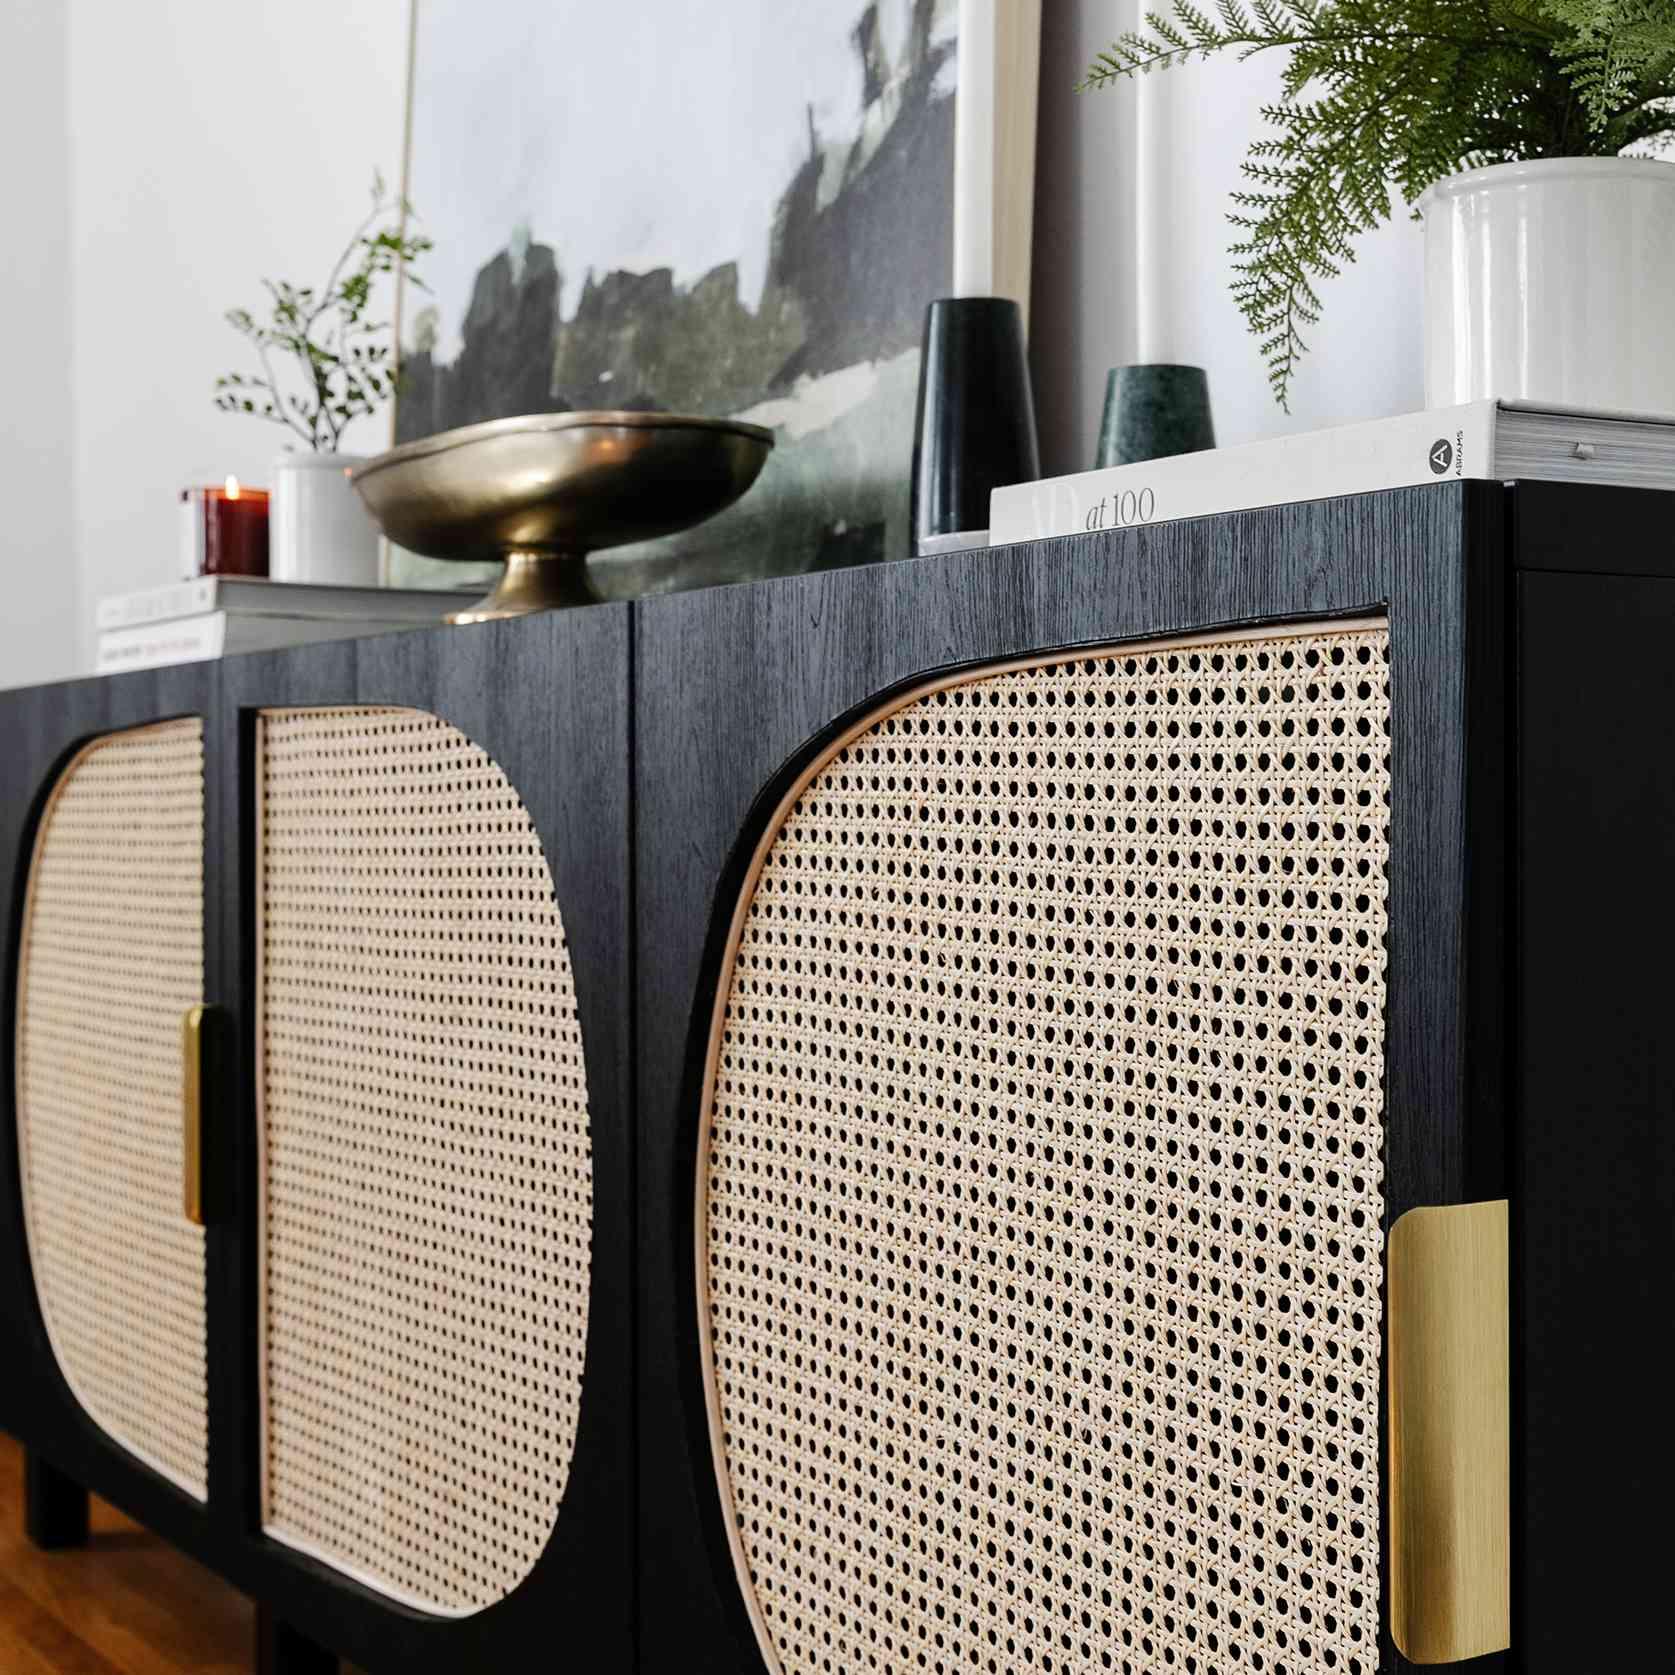 lone fox IKEA bestia unit diy - close up shot of cane media console